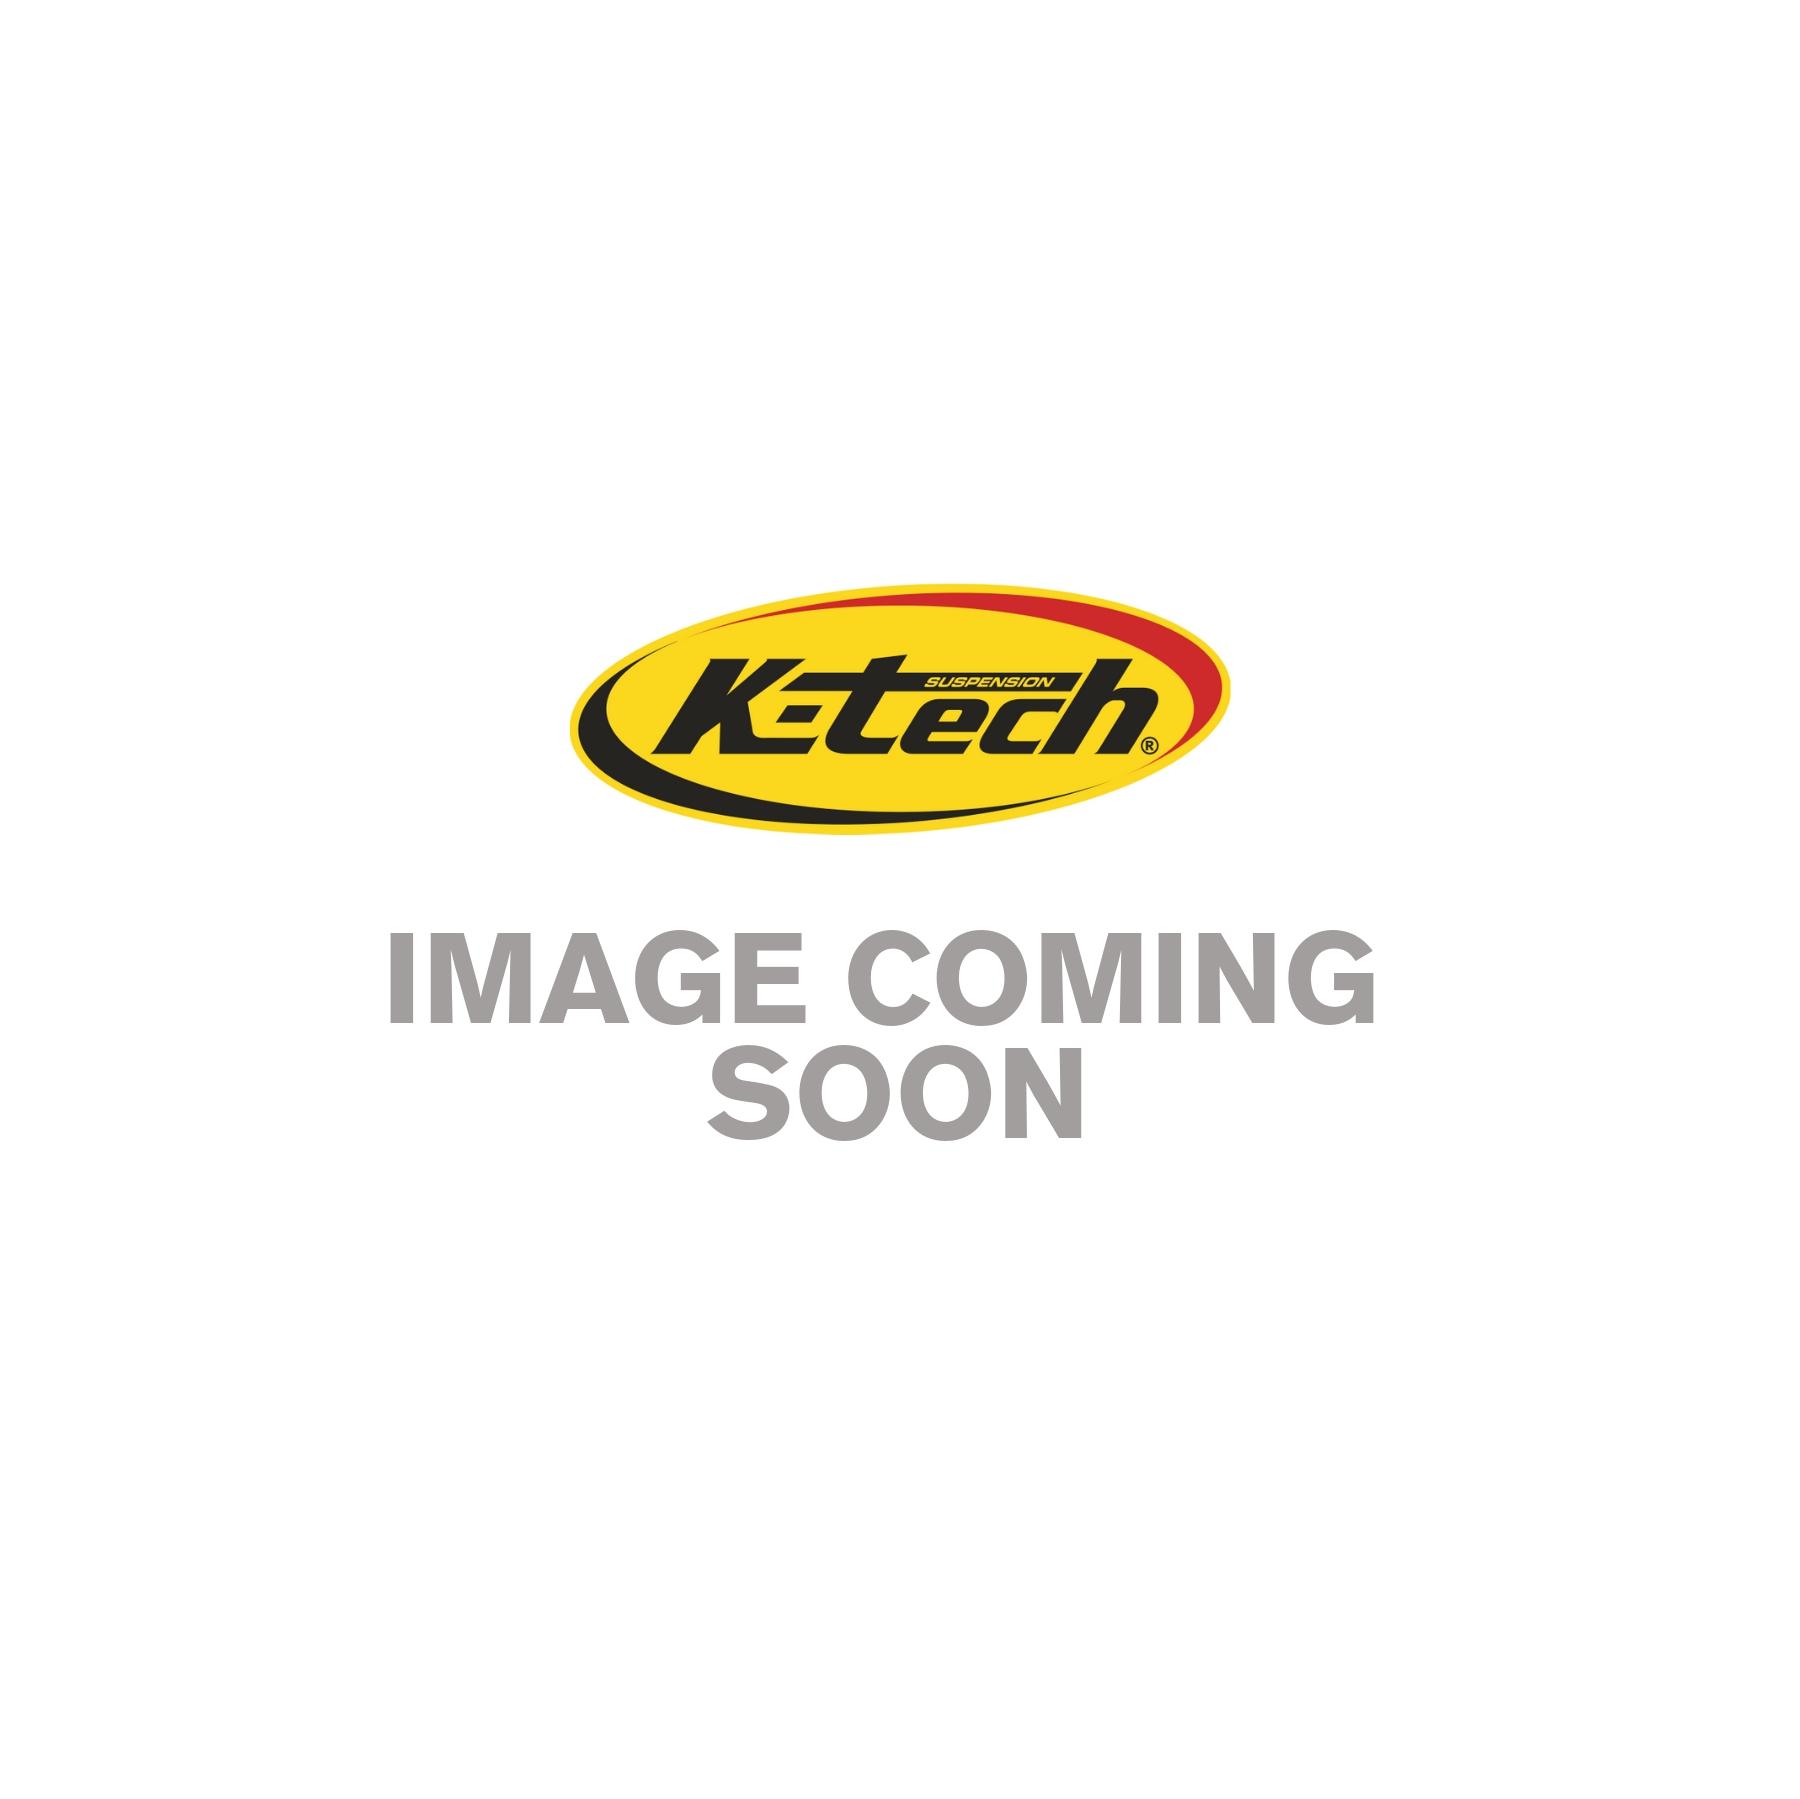 25IDS Front Fork Cartridges Triumph Daytona 675R 2011-2012 Ohlins